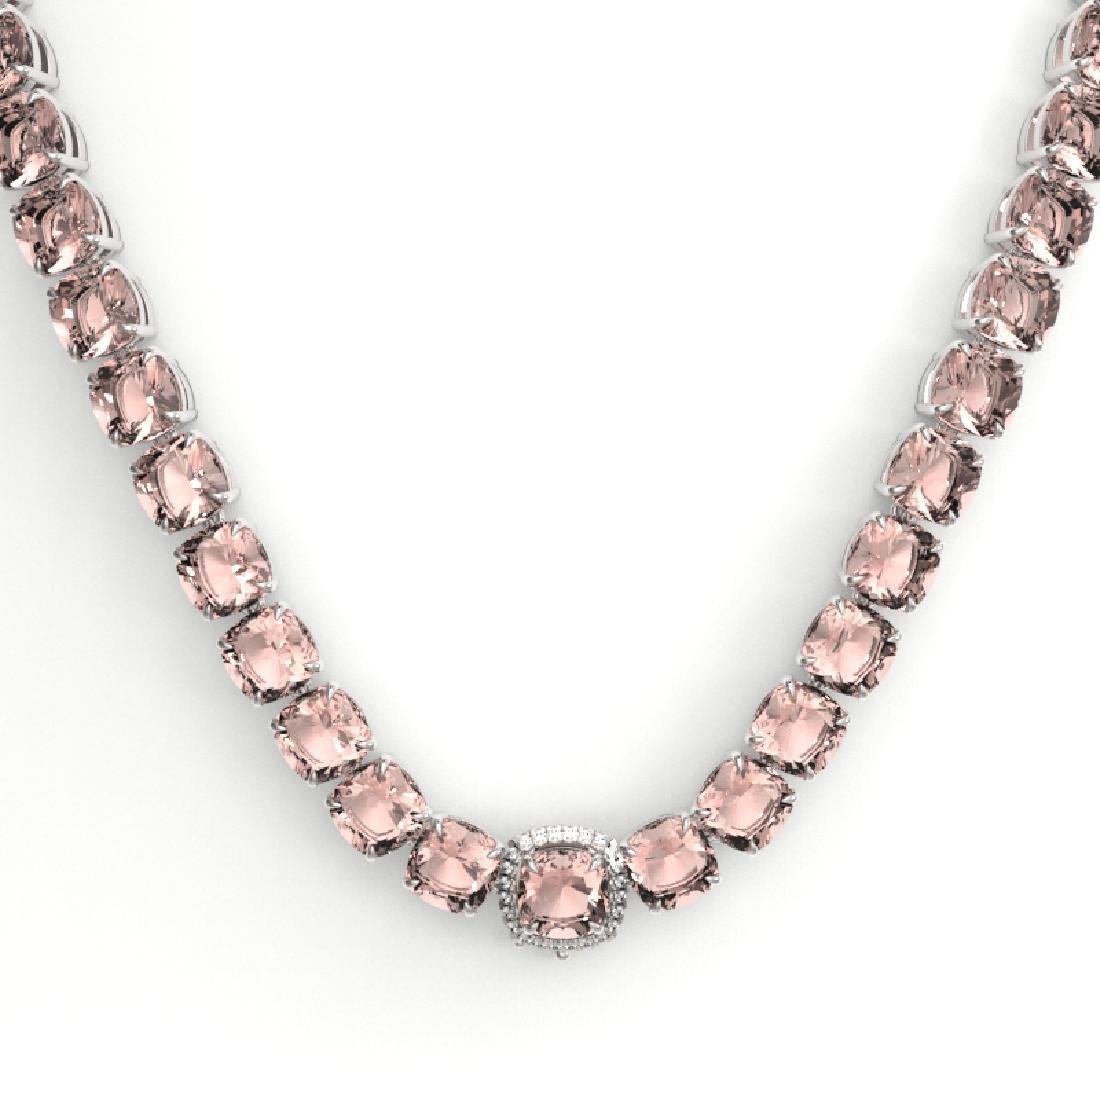 87 CTW Morganite & VS/SI Diamond Necklace 14K White - 2